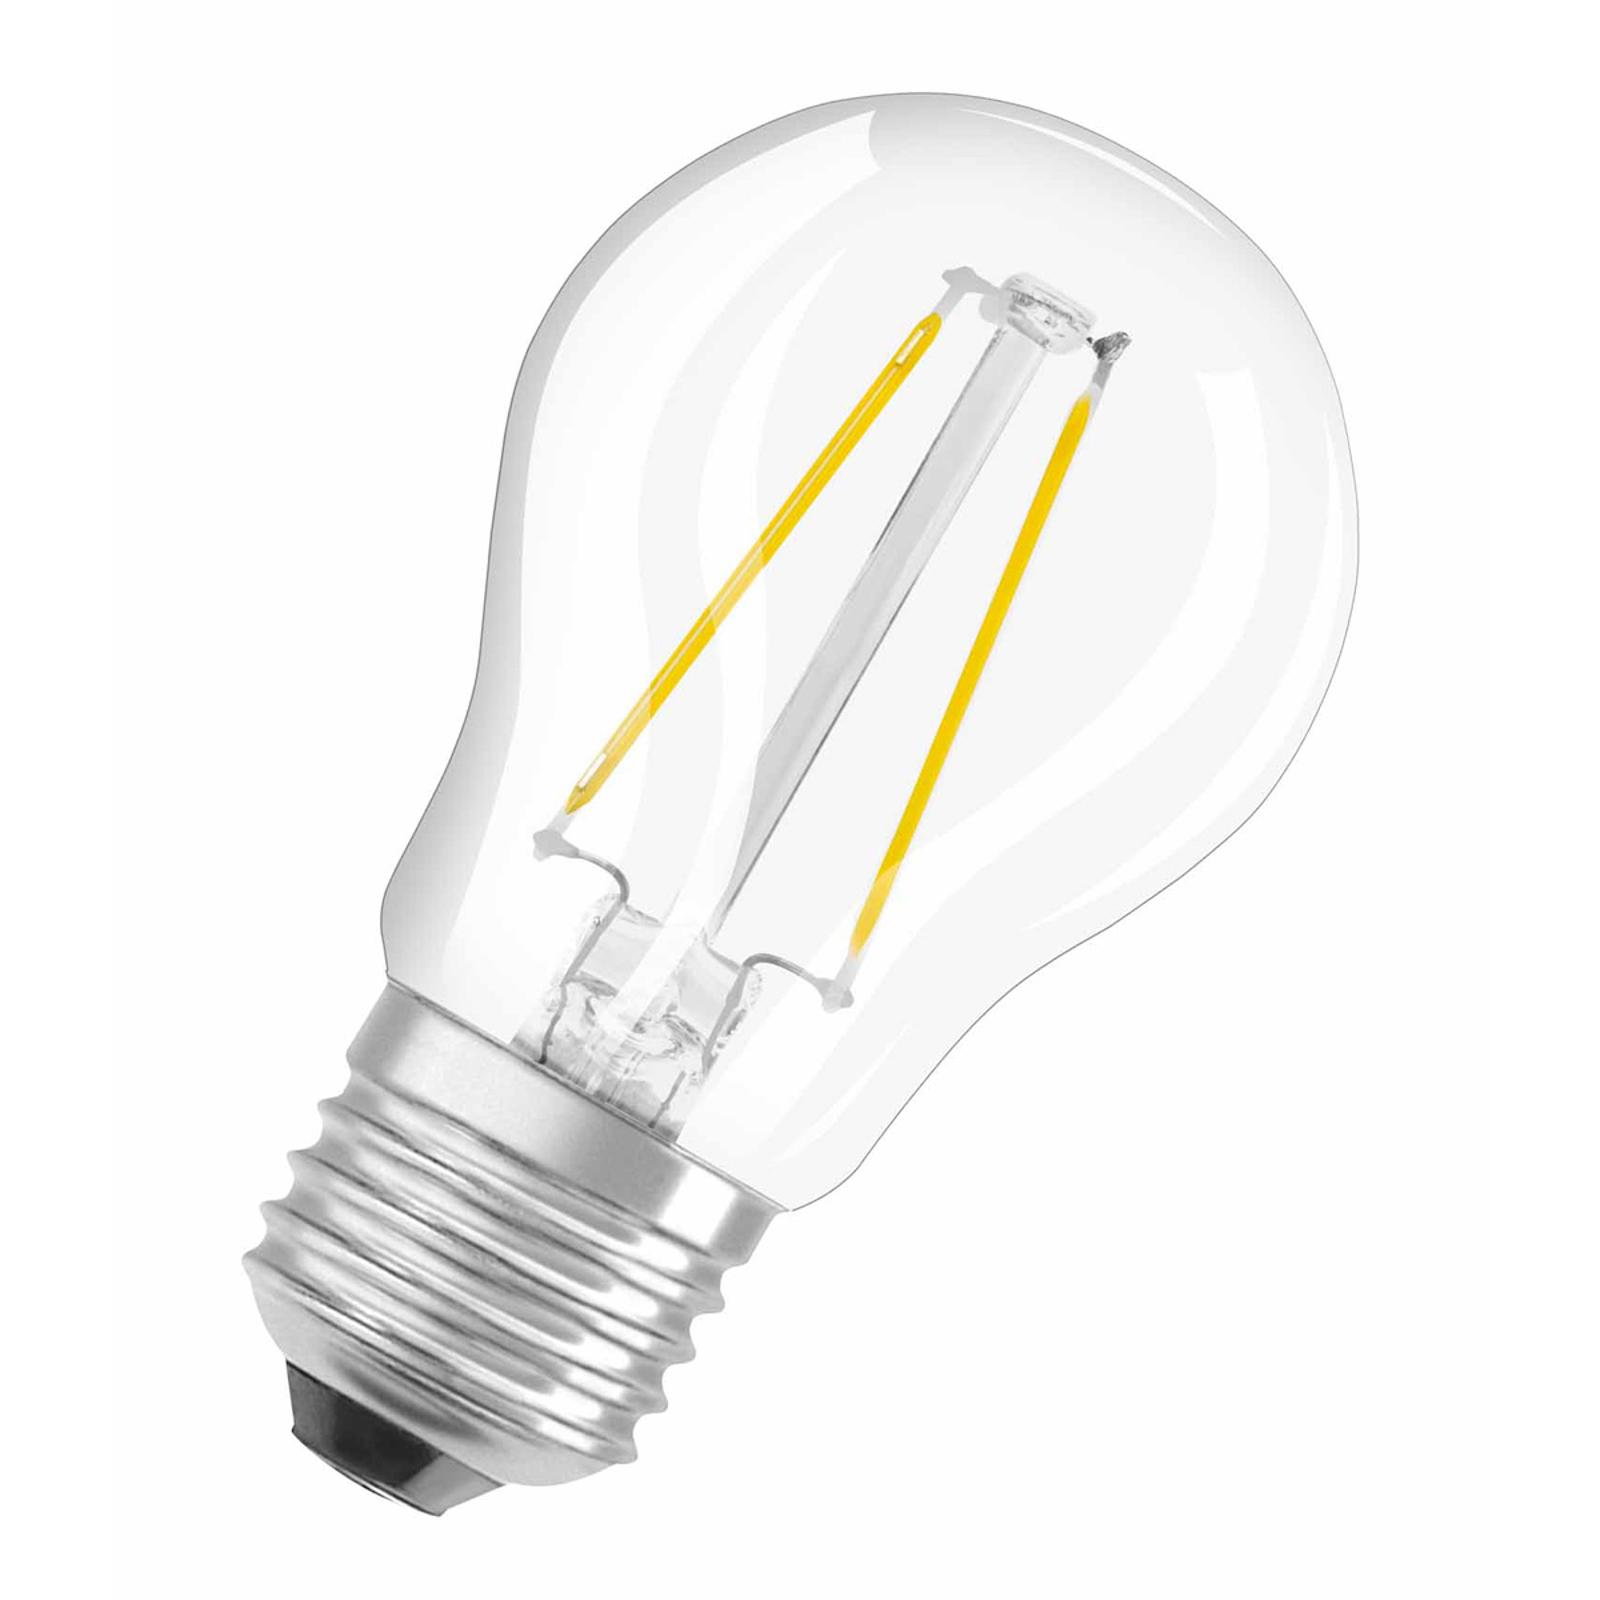 OSRAM lampadina LED E27 1,5W goccia filamenti 827